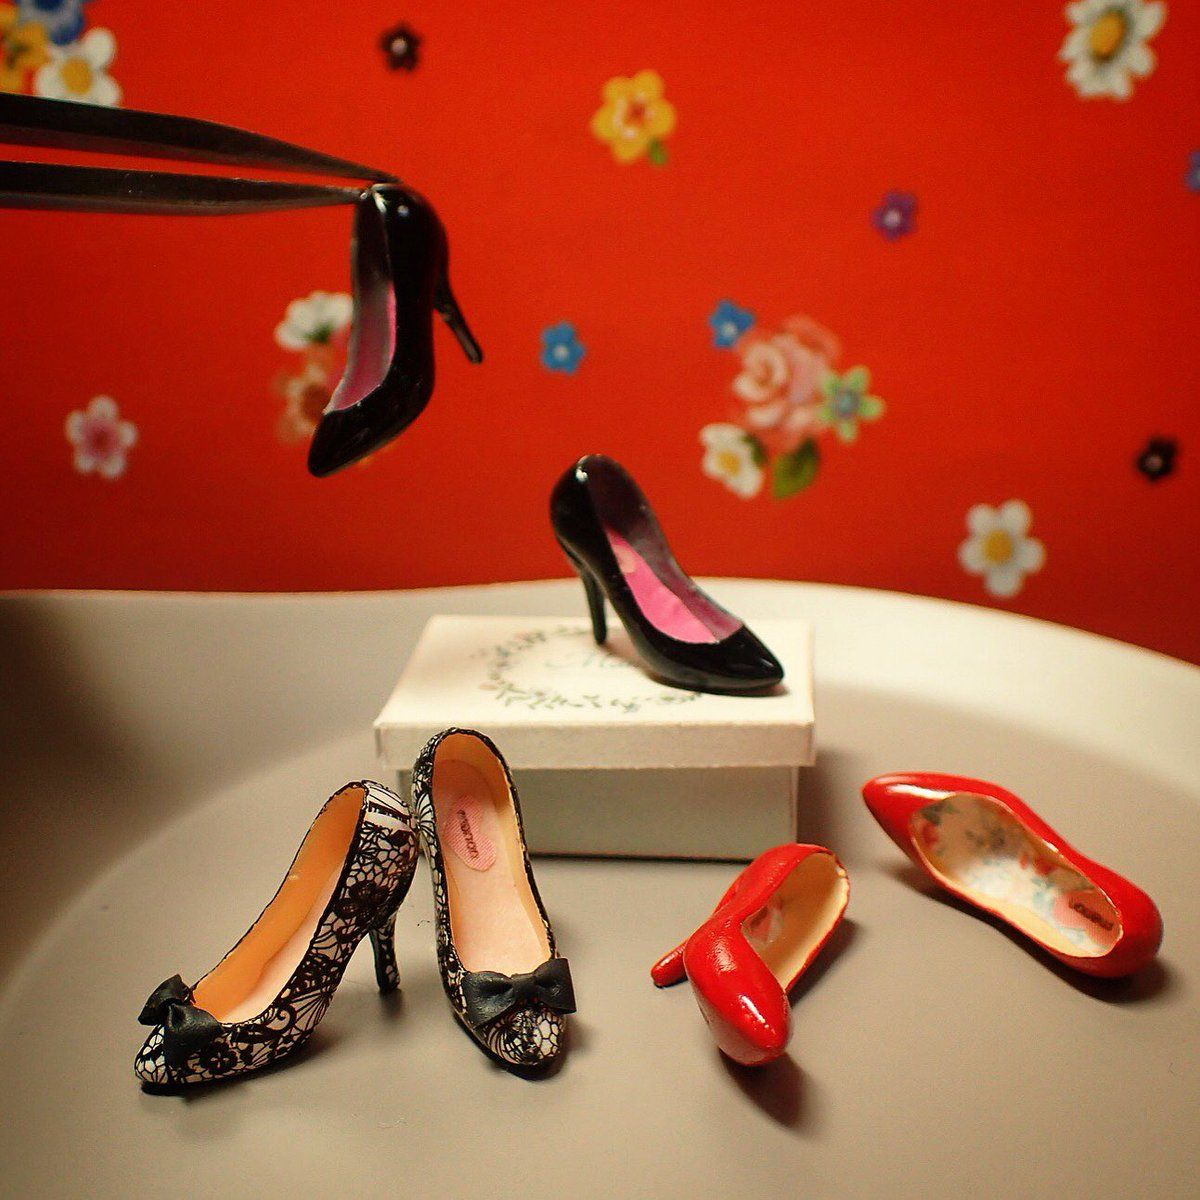 1:12 Dollhouse Miniature DIY Cabin Fittings Stiletto Shoes ToysODCA BHCA